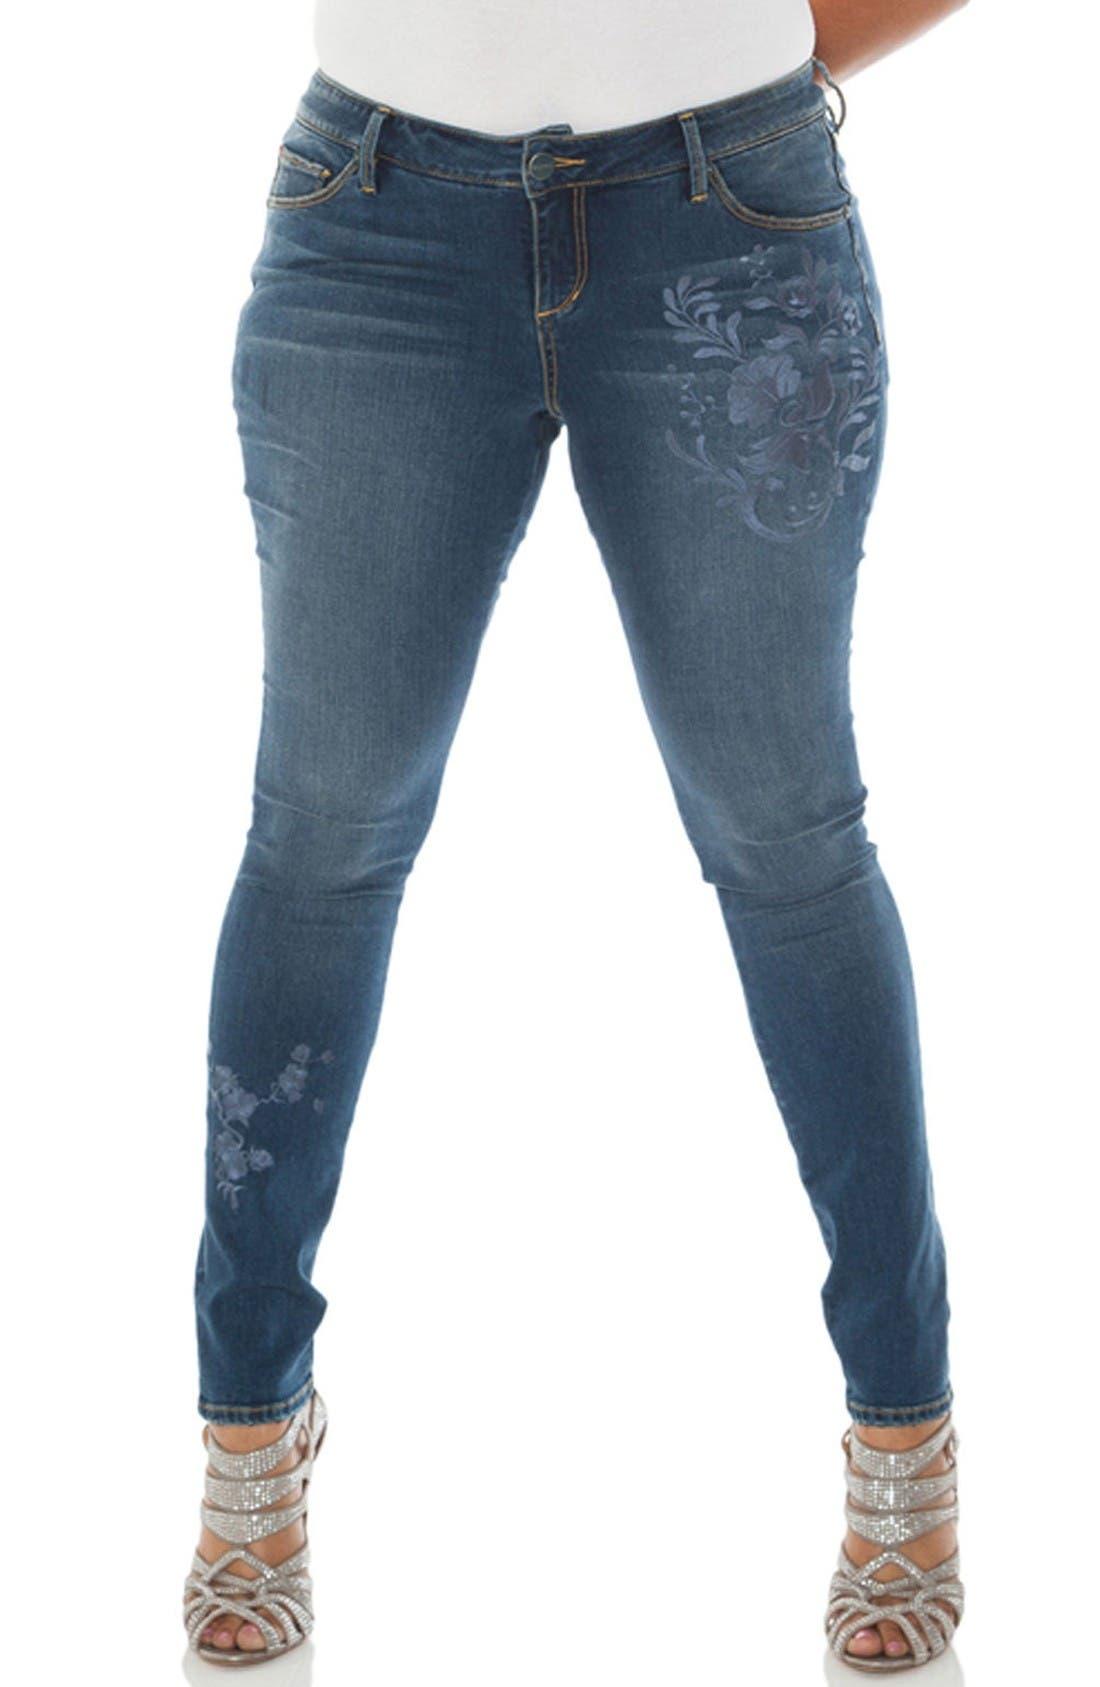 SLINK JEANS Embroidered Skinny Jeans